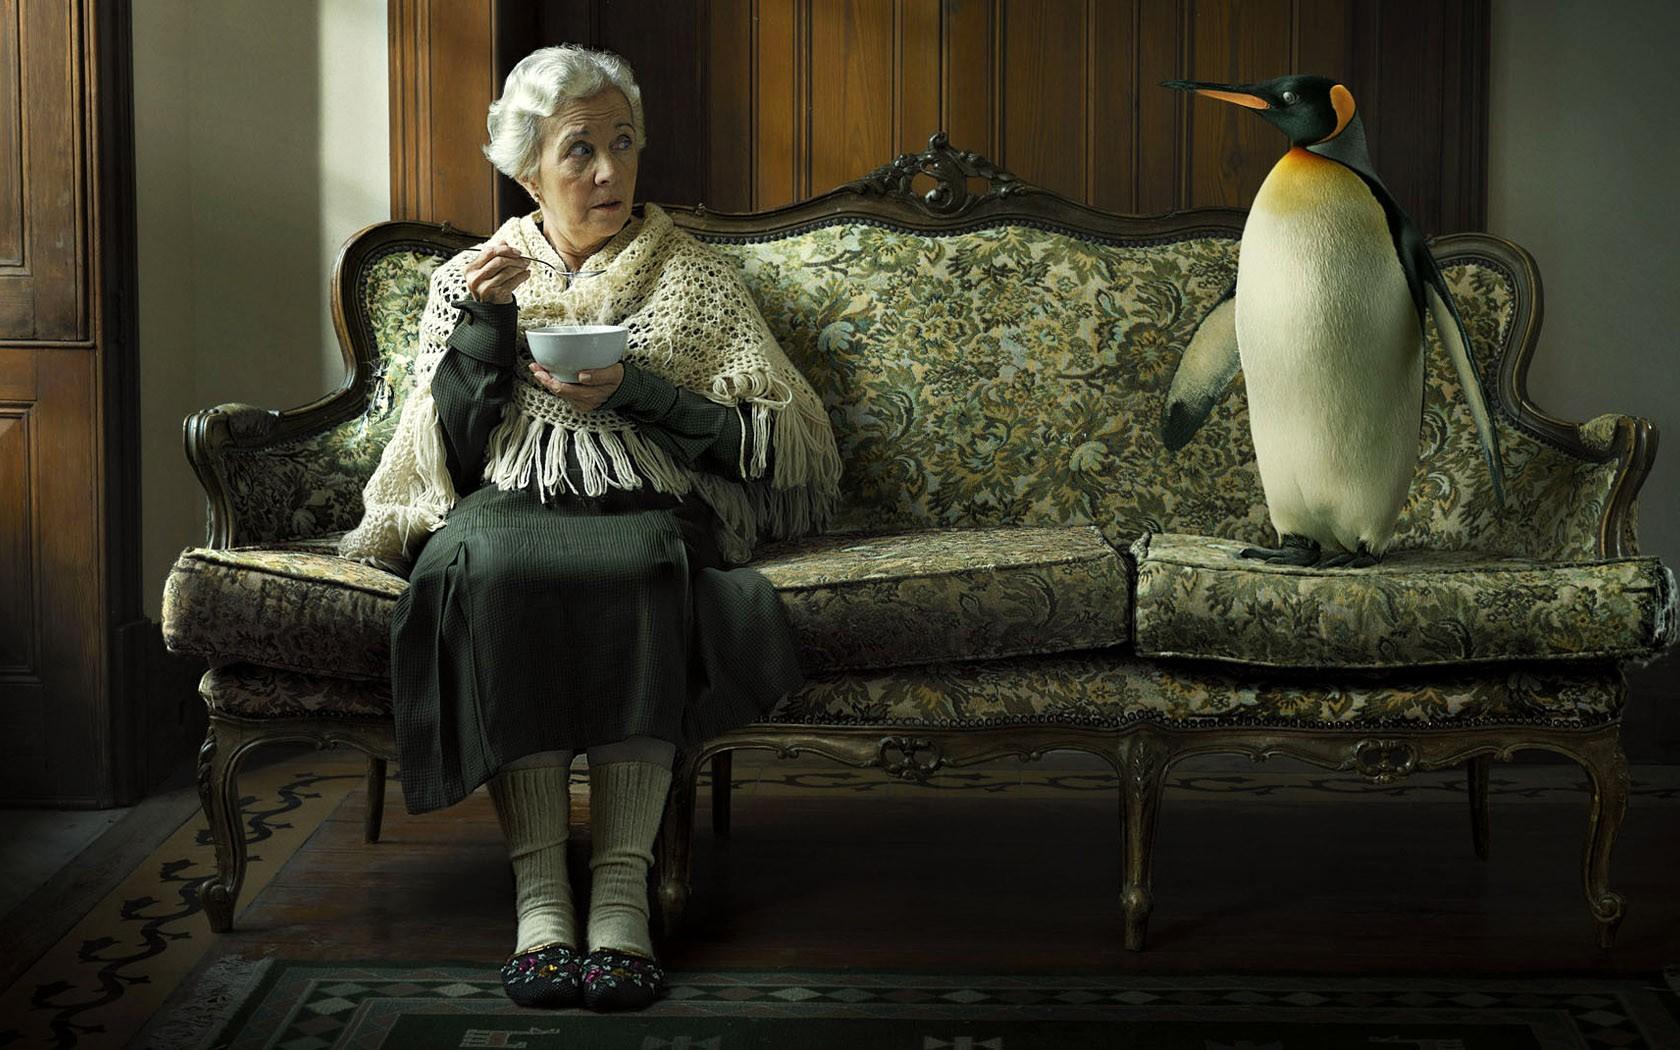 Животные » Приколы на XA-XA.ORG: Тысячи фото, картинки ...